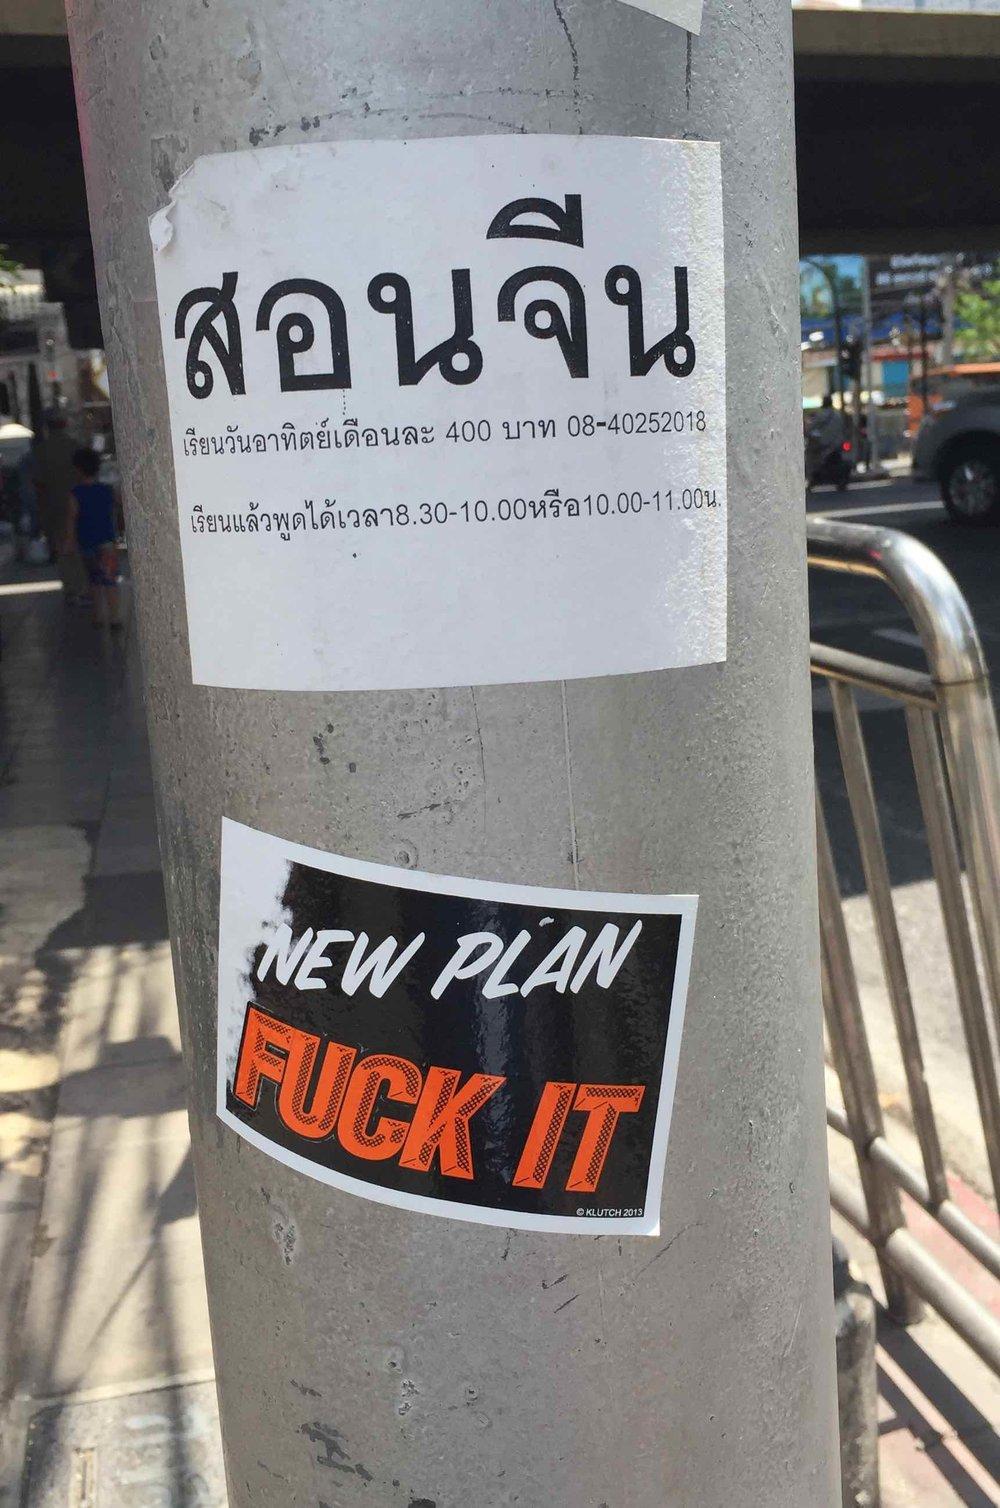 think they misspelled Phuket